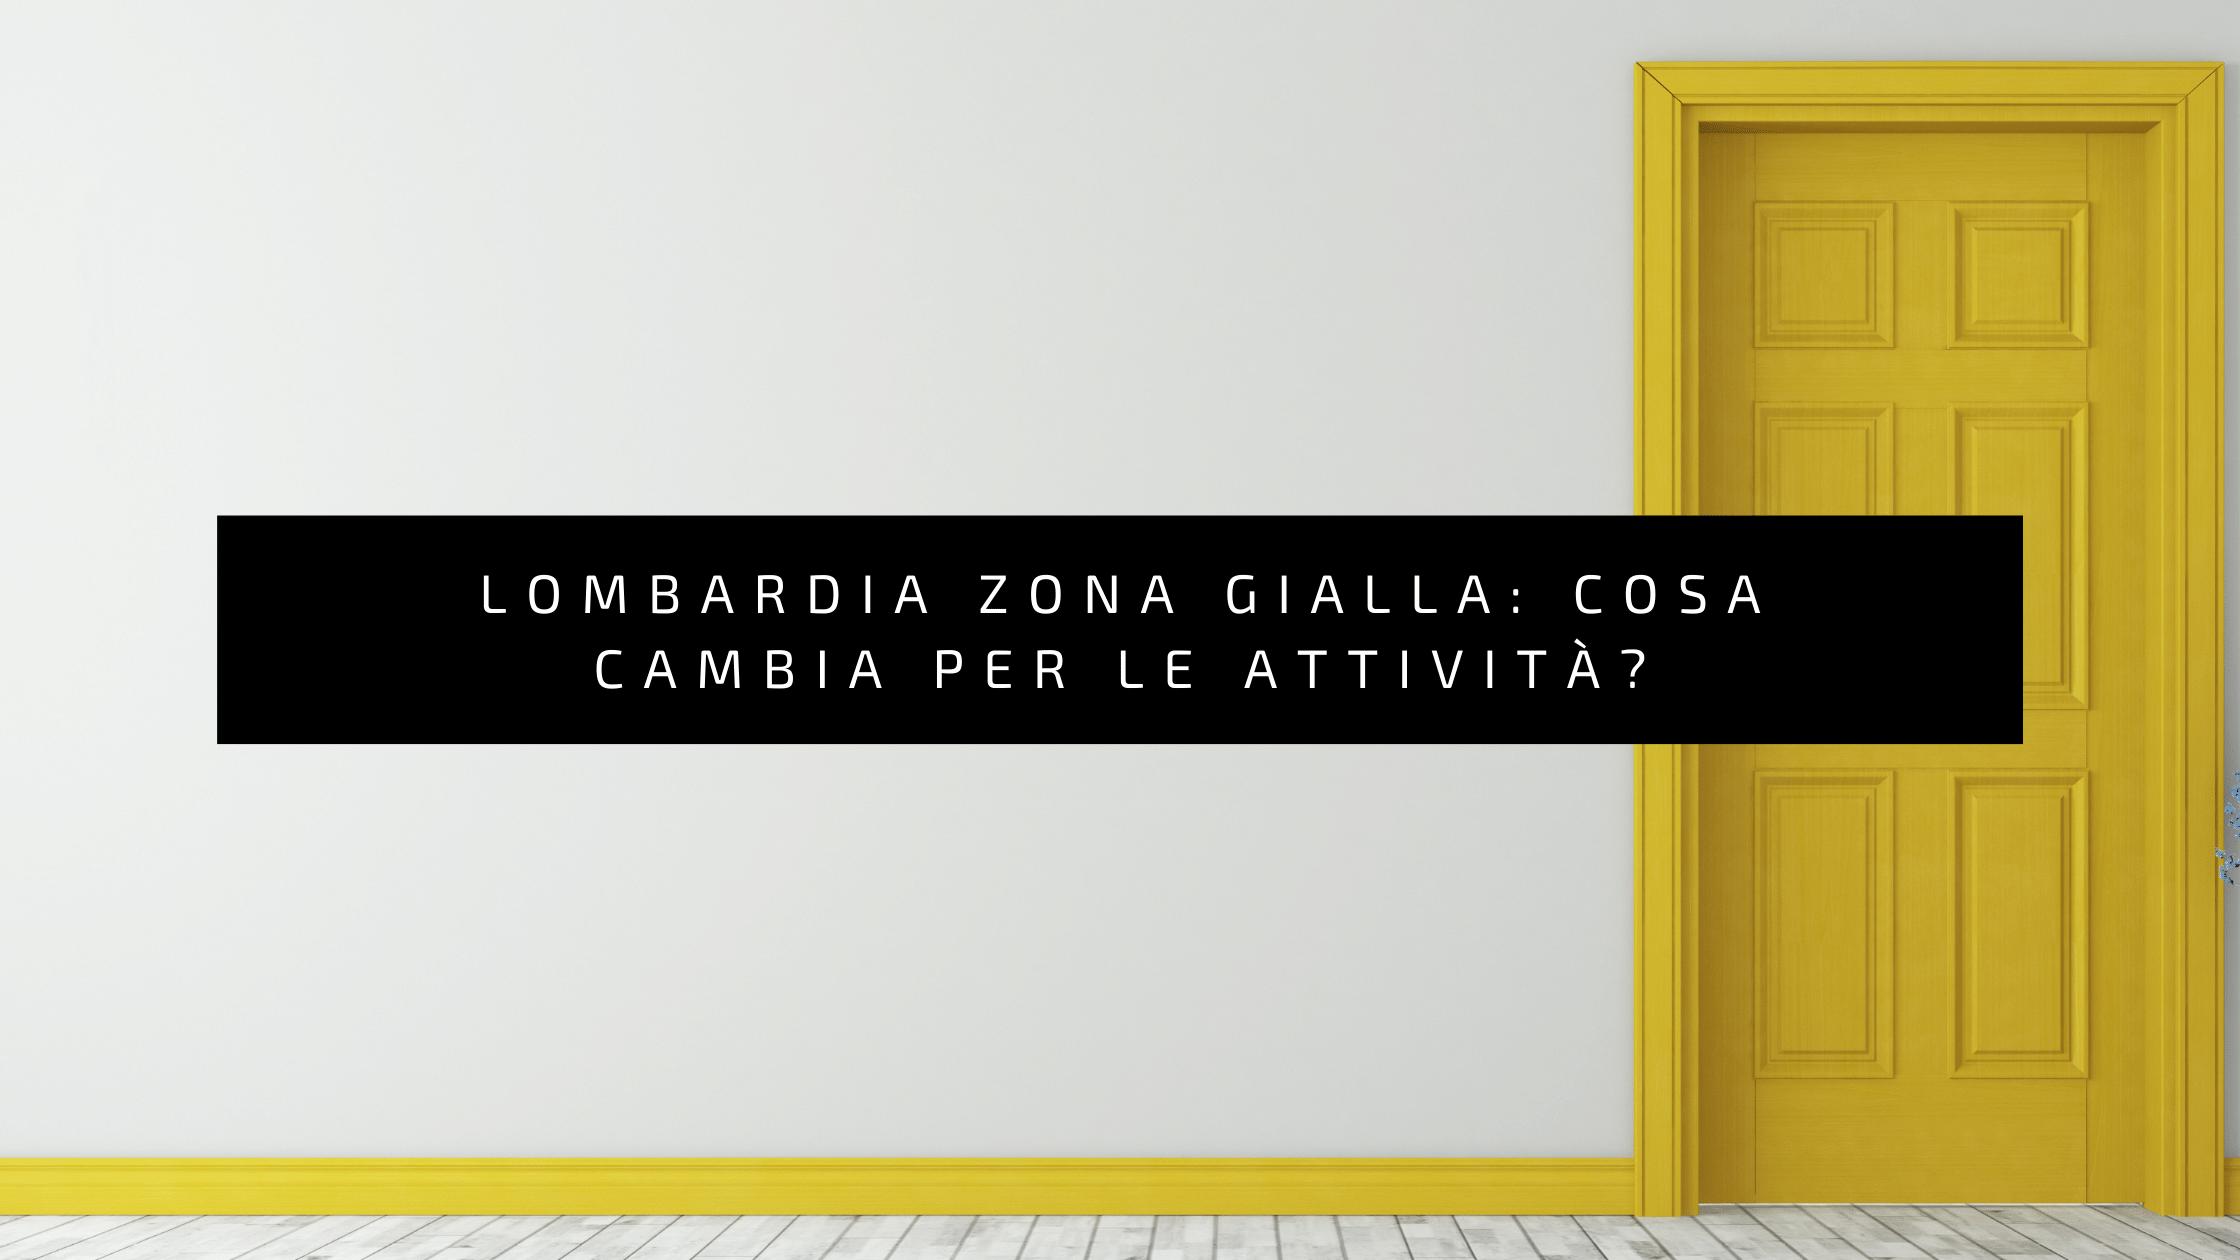 Lombardia zona gialla: cosa cambia